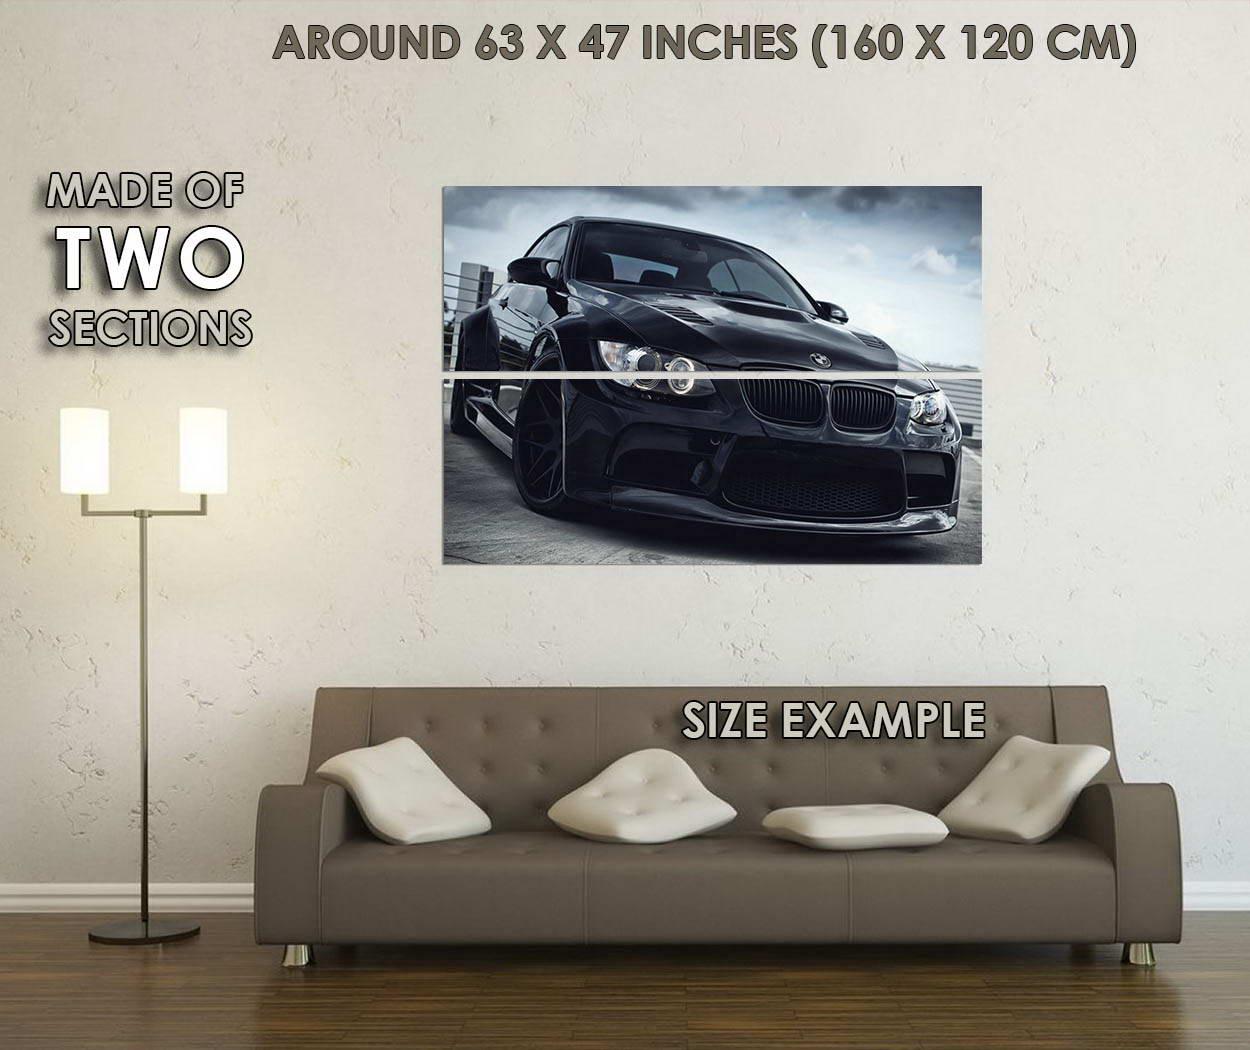 10300-BMW-M3-Supercar-Car-Art-LAMINATED-POSTER-CA thumbnail 6